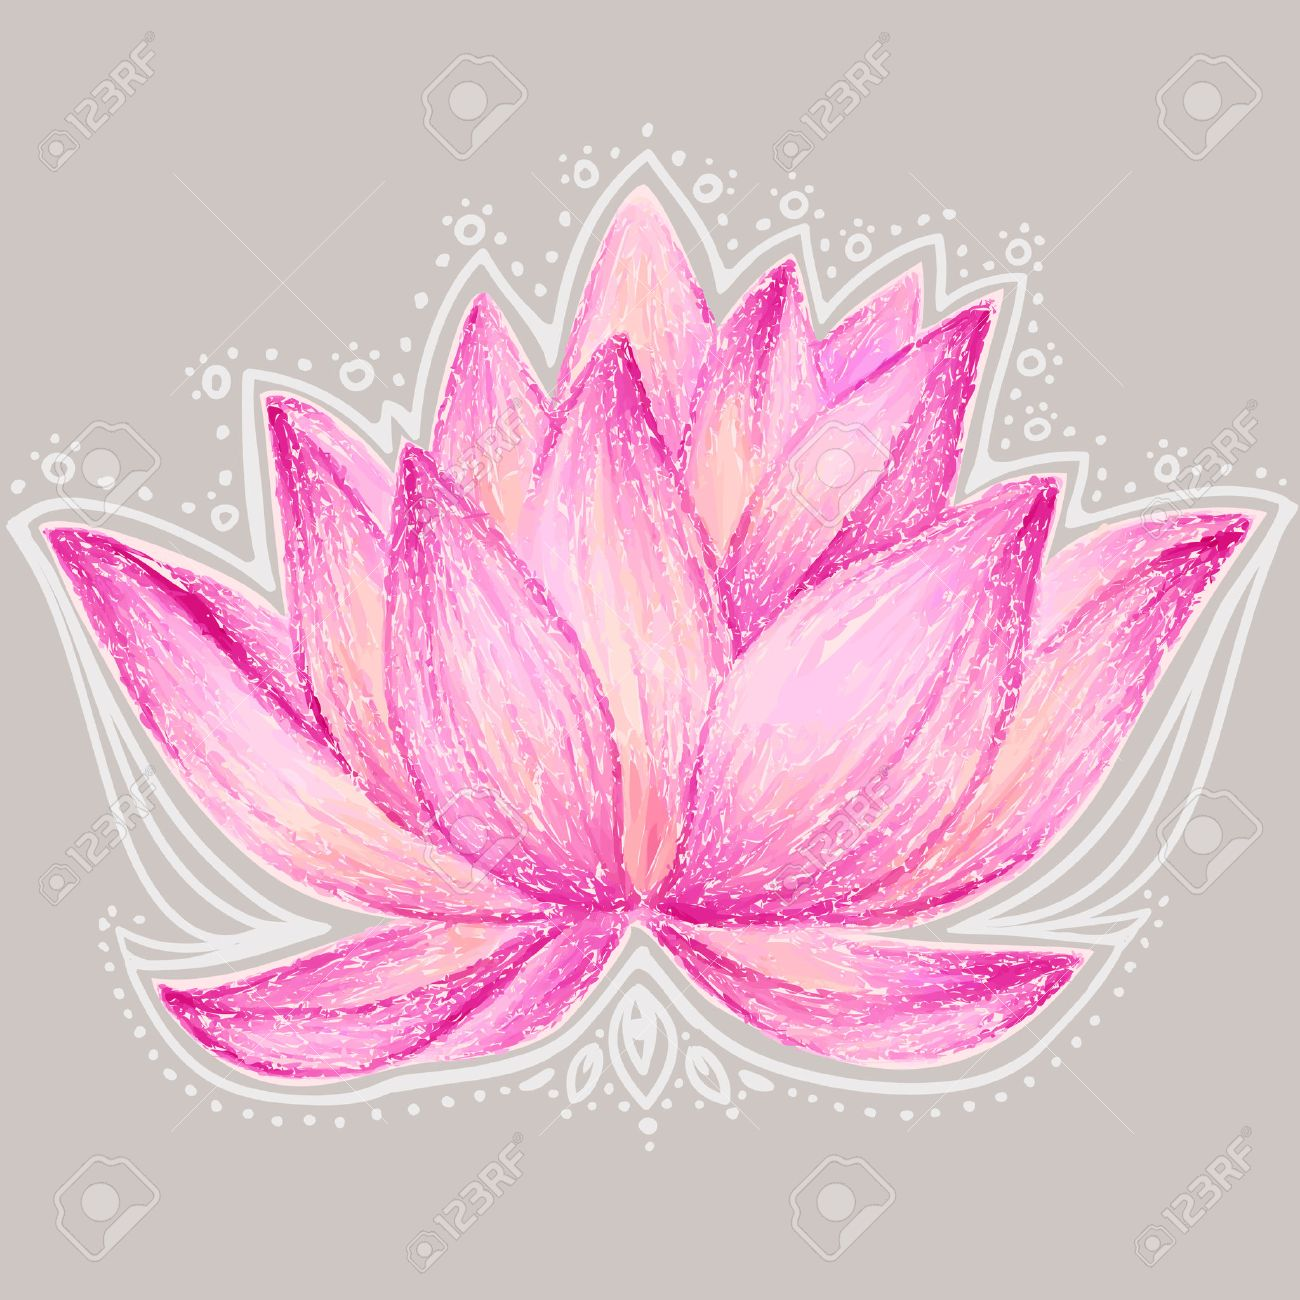 Beautiful Lotus Flower Illustration Lotus Flower Design Card